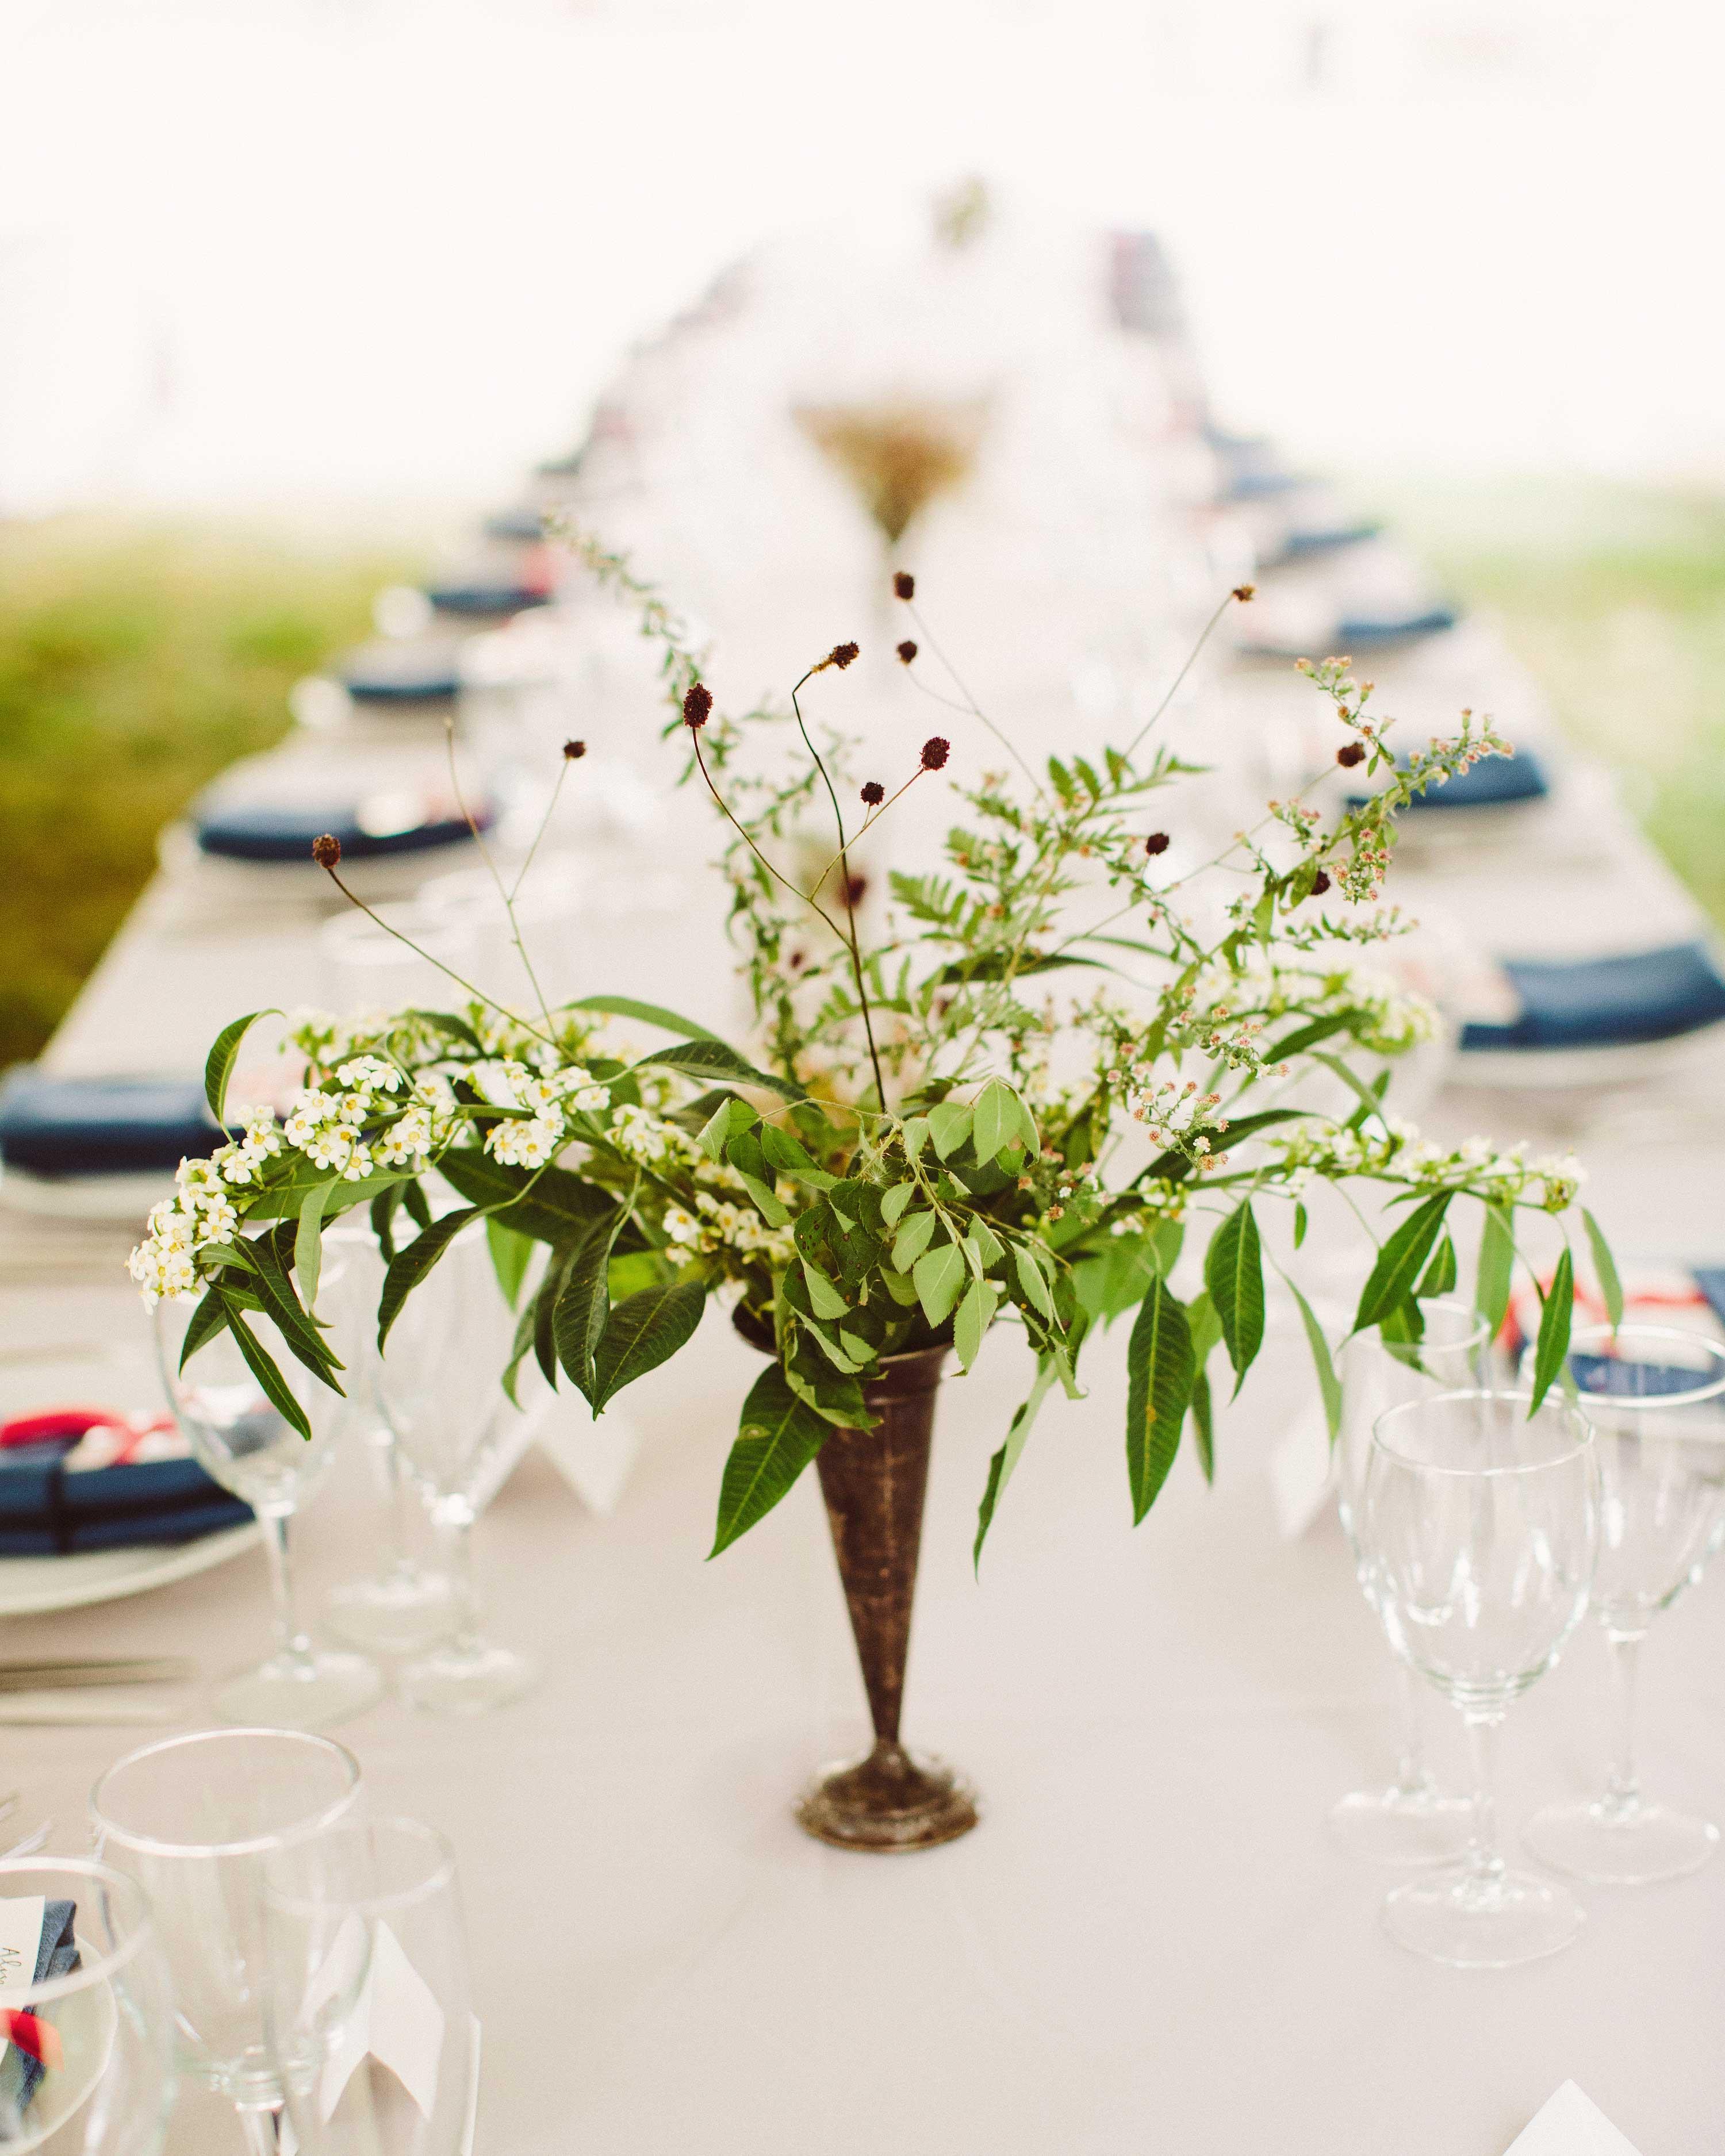 alisa-barrett-wedding-centerpiece-972-s113048-0716.jpg